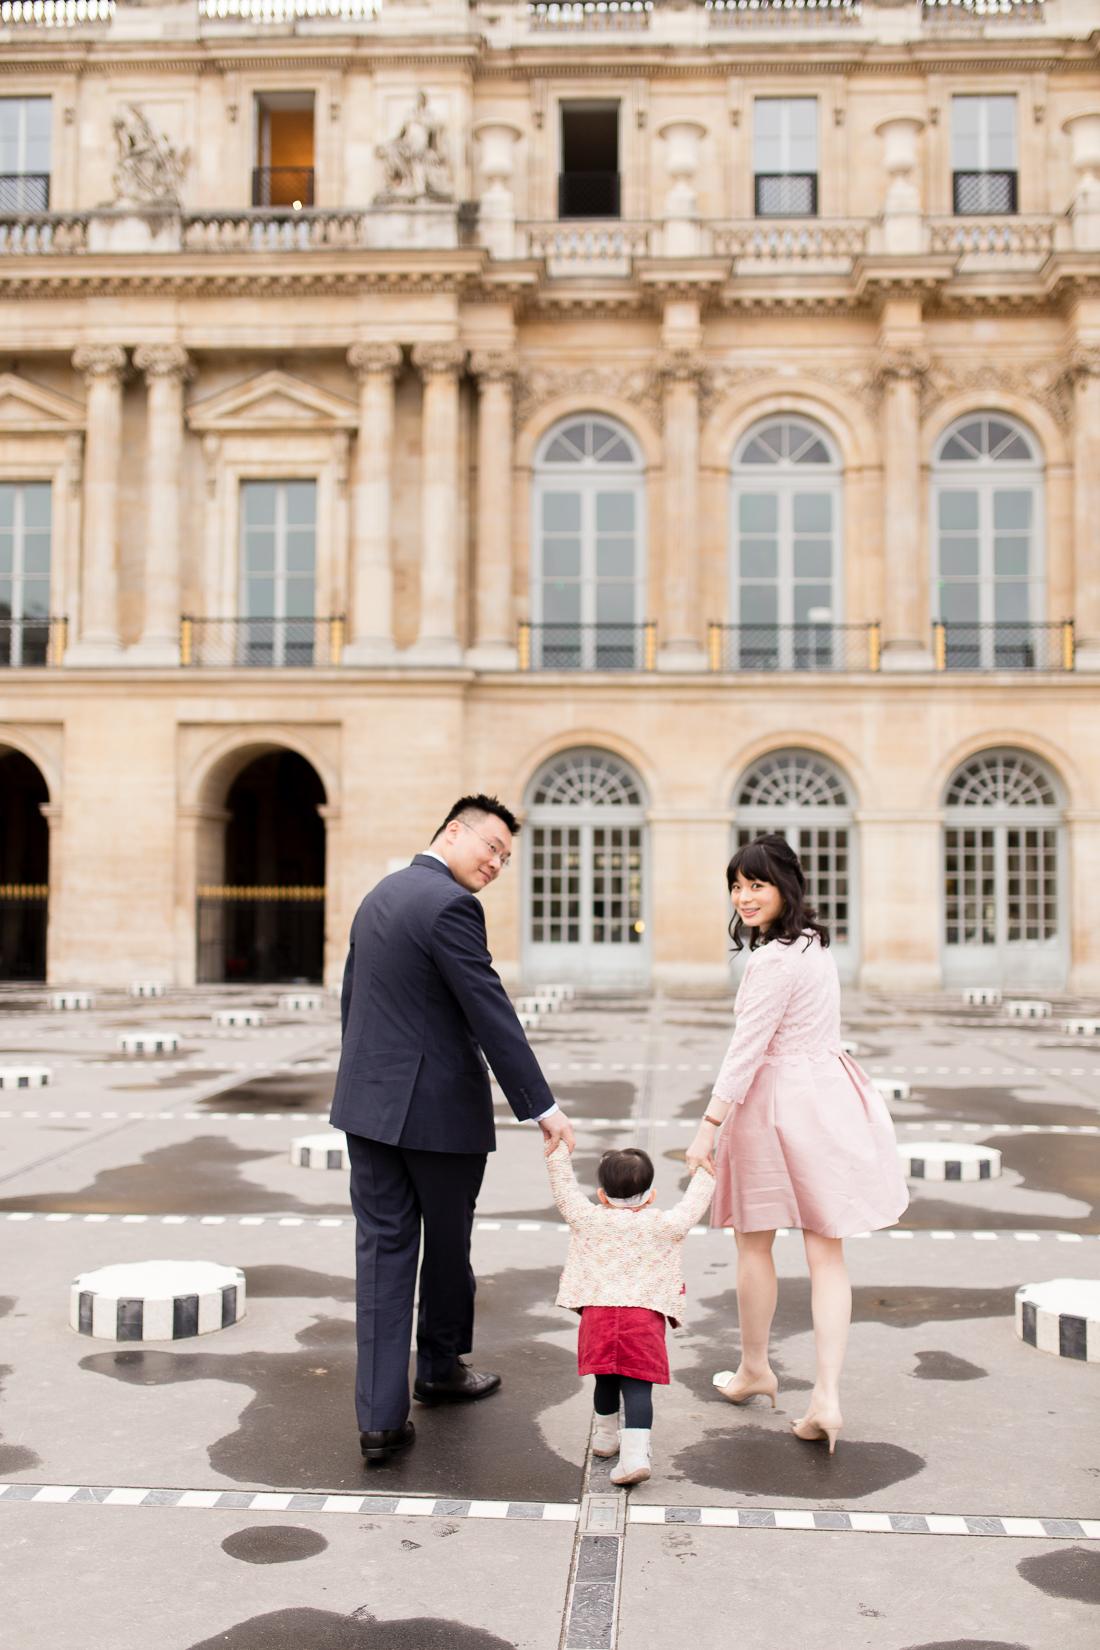 spring-fall-family-maternity-paris-palais-royal-louvre-photo-session-inspiration-2